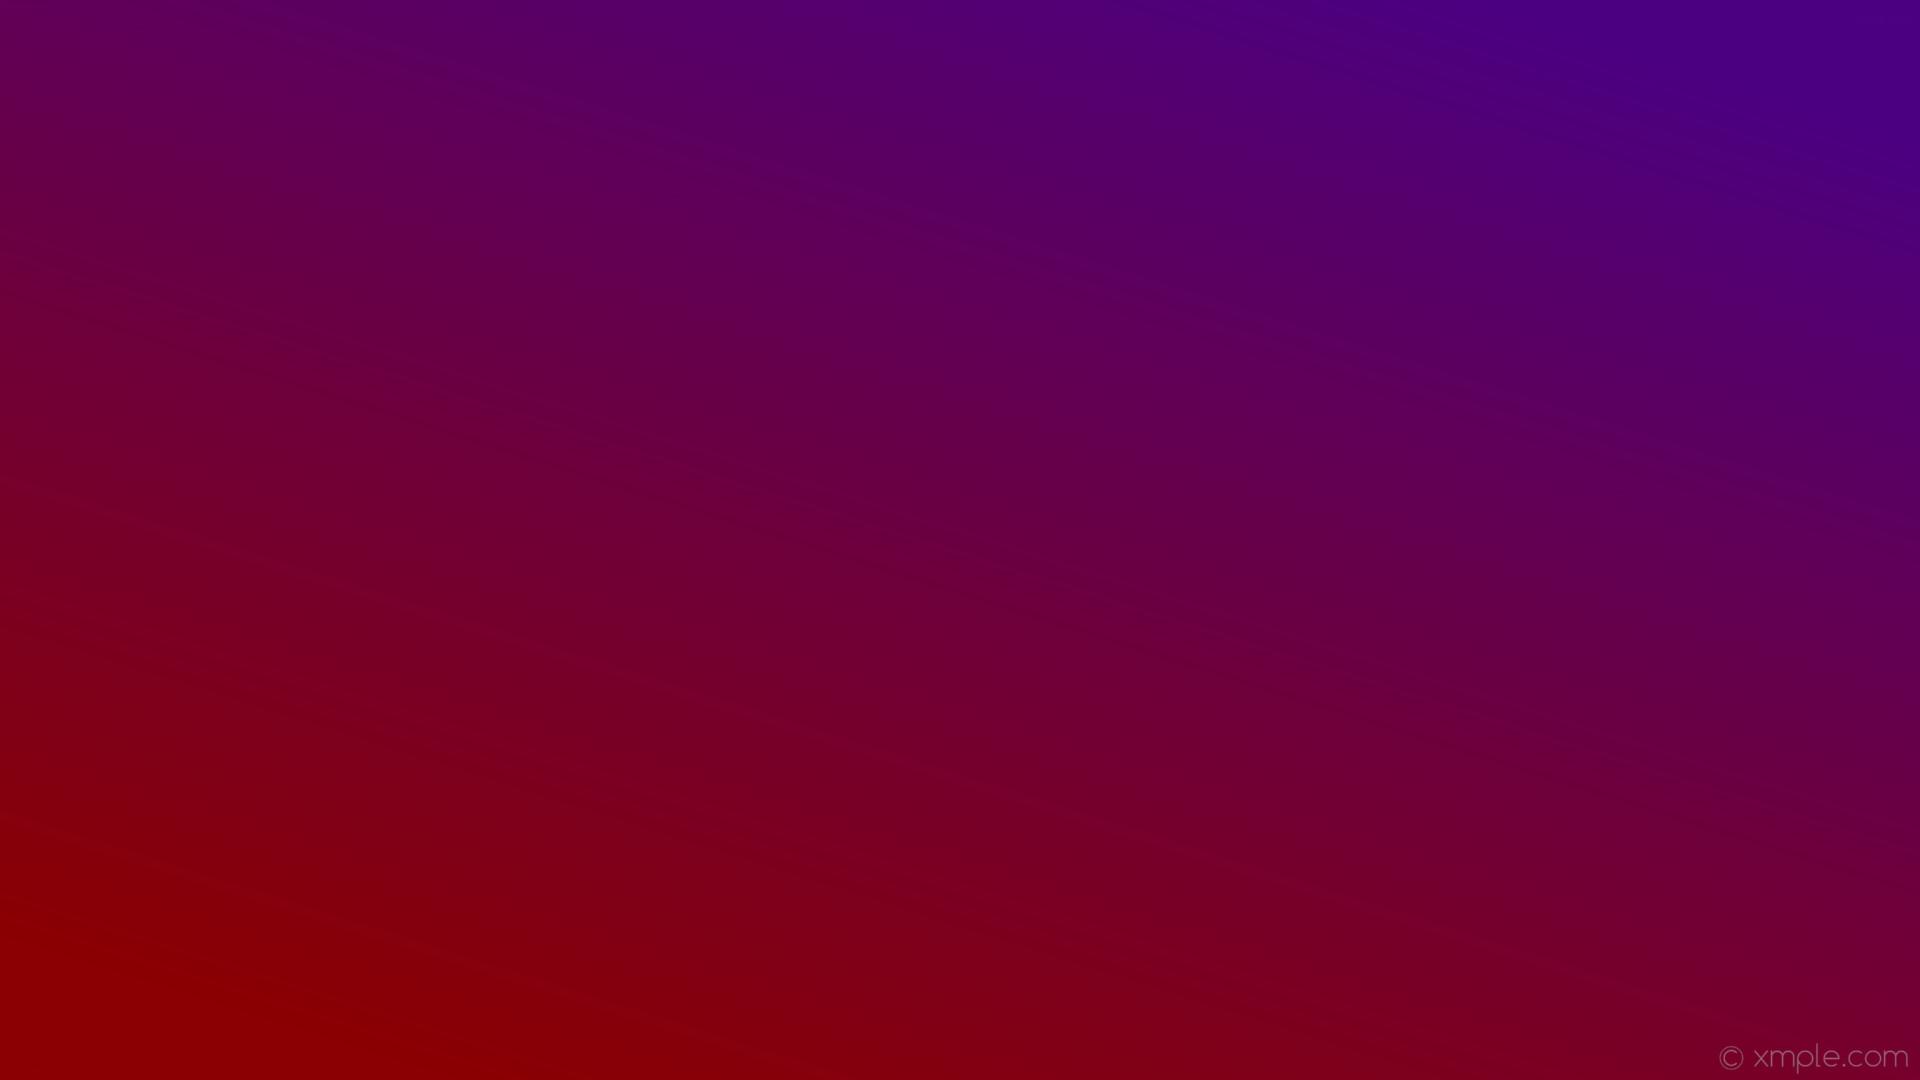 wallpaper gradient red linear purple dark red indigo #8b0000 #4b0082 225°